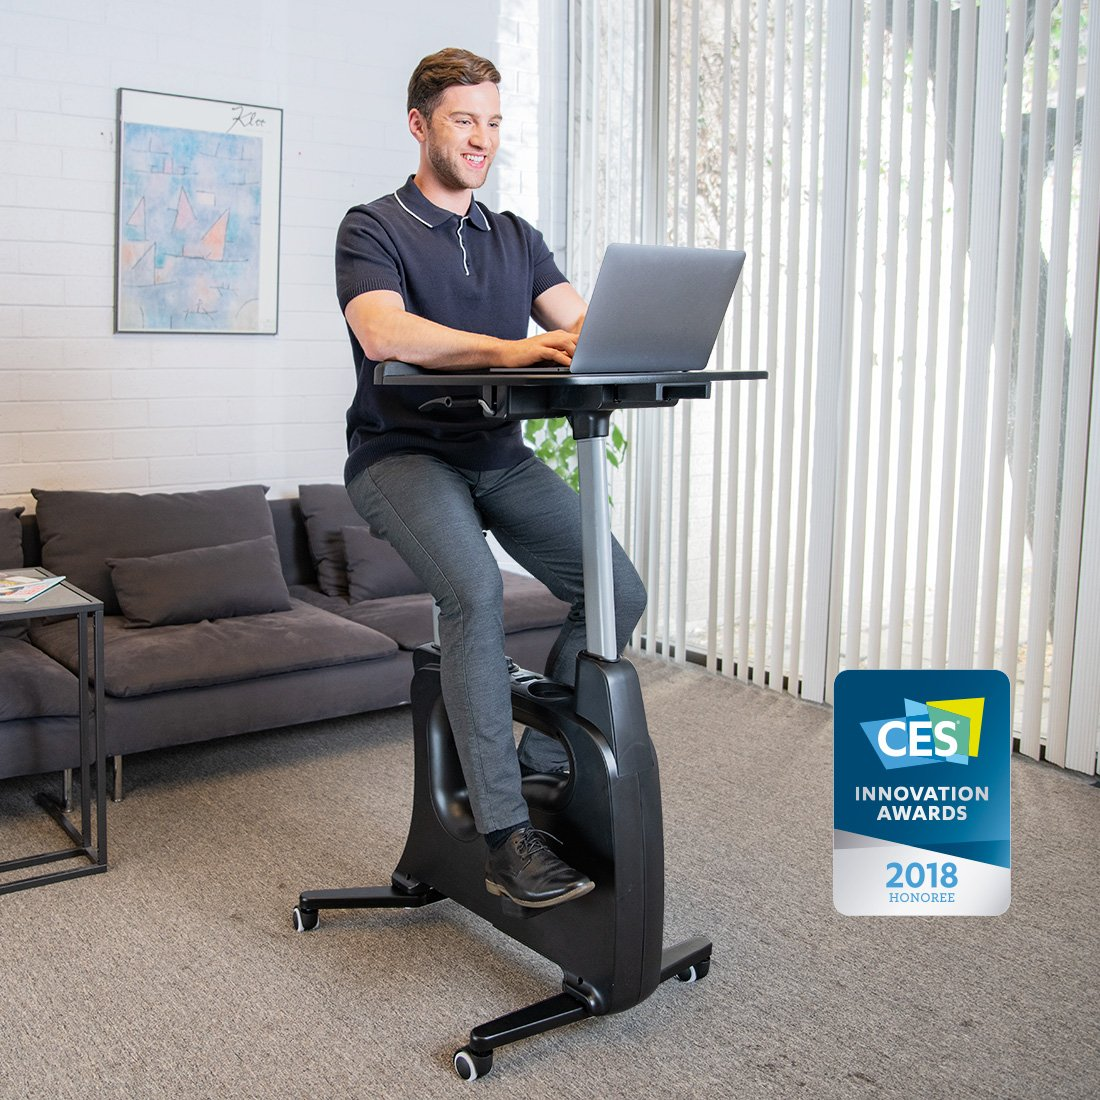 FLEXISPOT V9 Serie Höhenverstellbares Tischfahrrad, Heimtrainer, Fitnessfahrrad Ergometer Fitnessbike